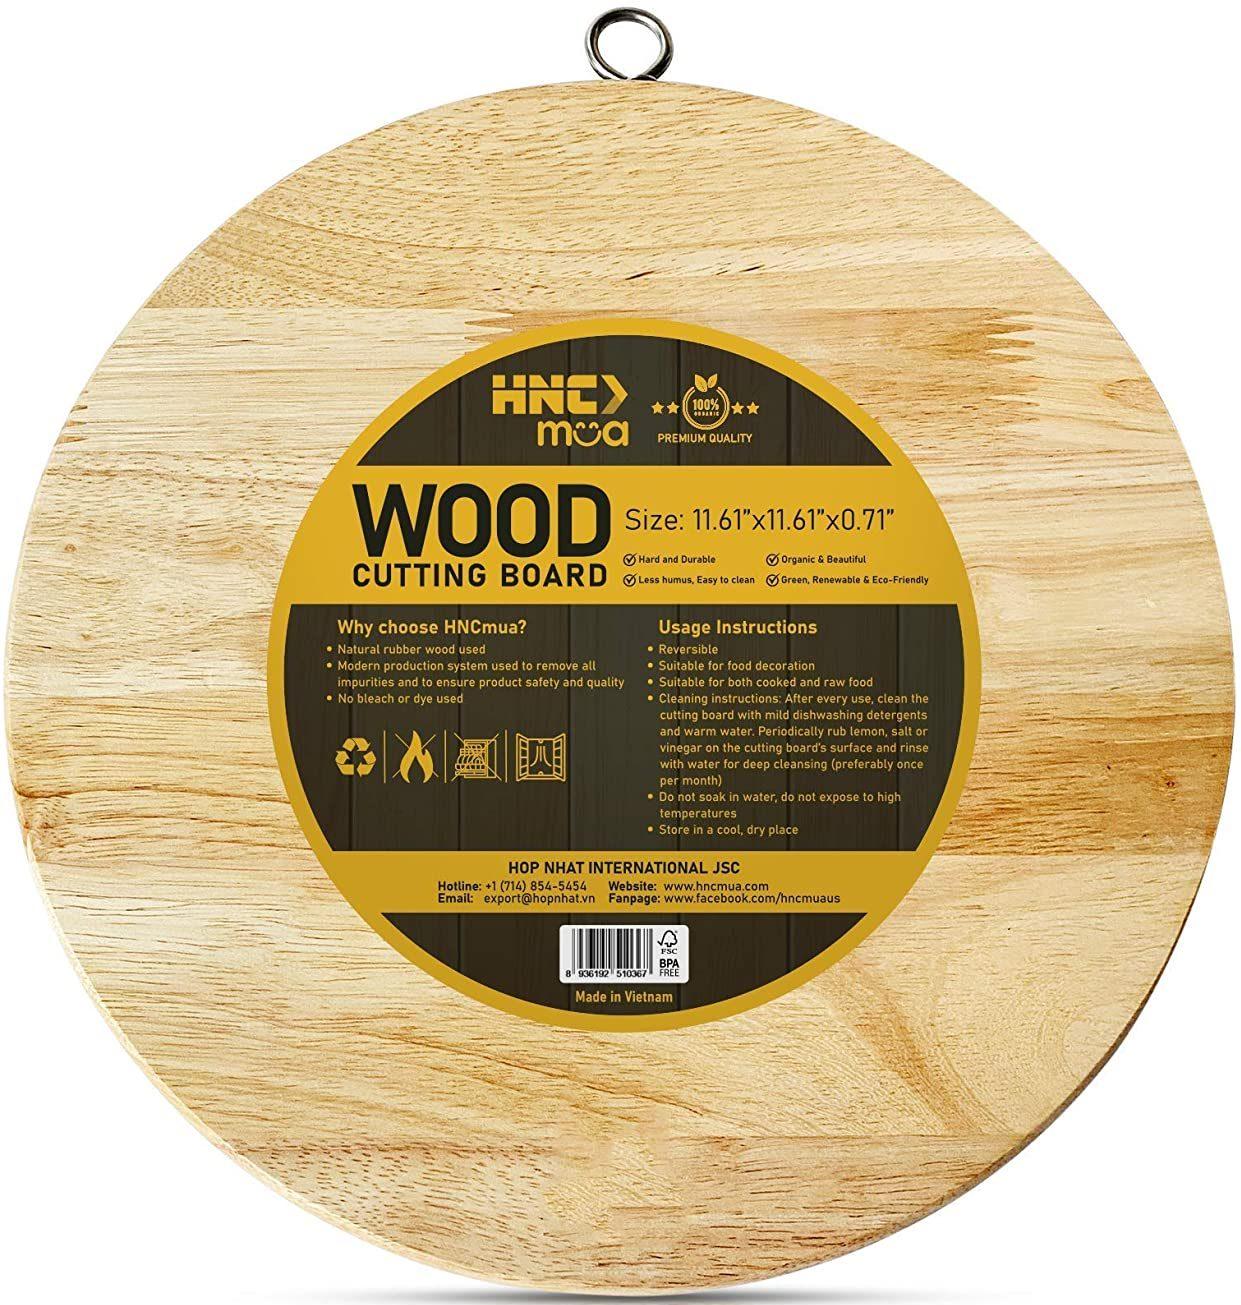 HNCmua Round Wood Cutting Board